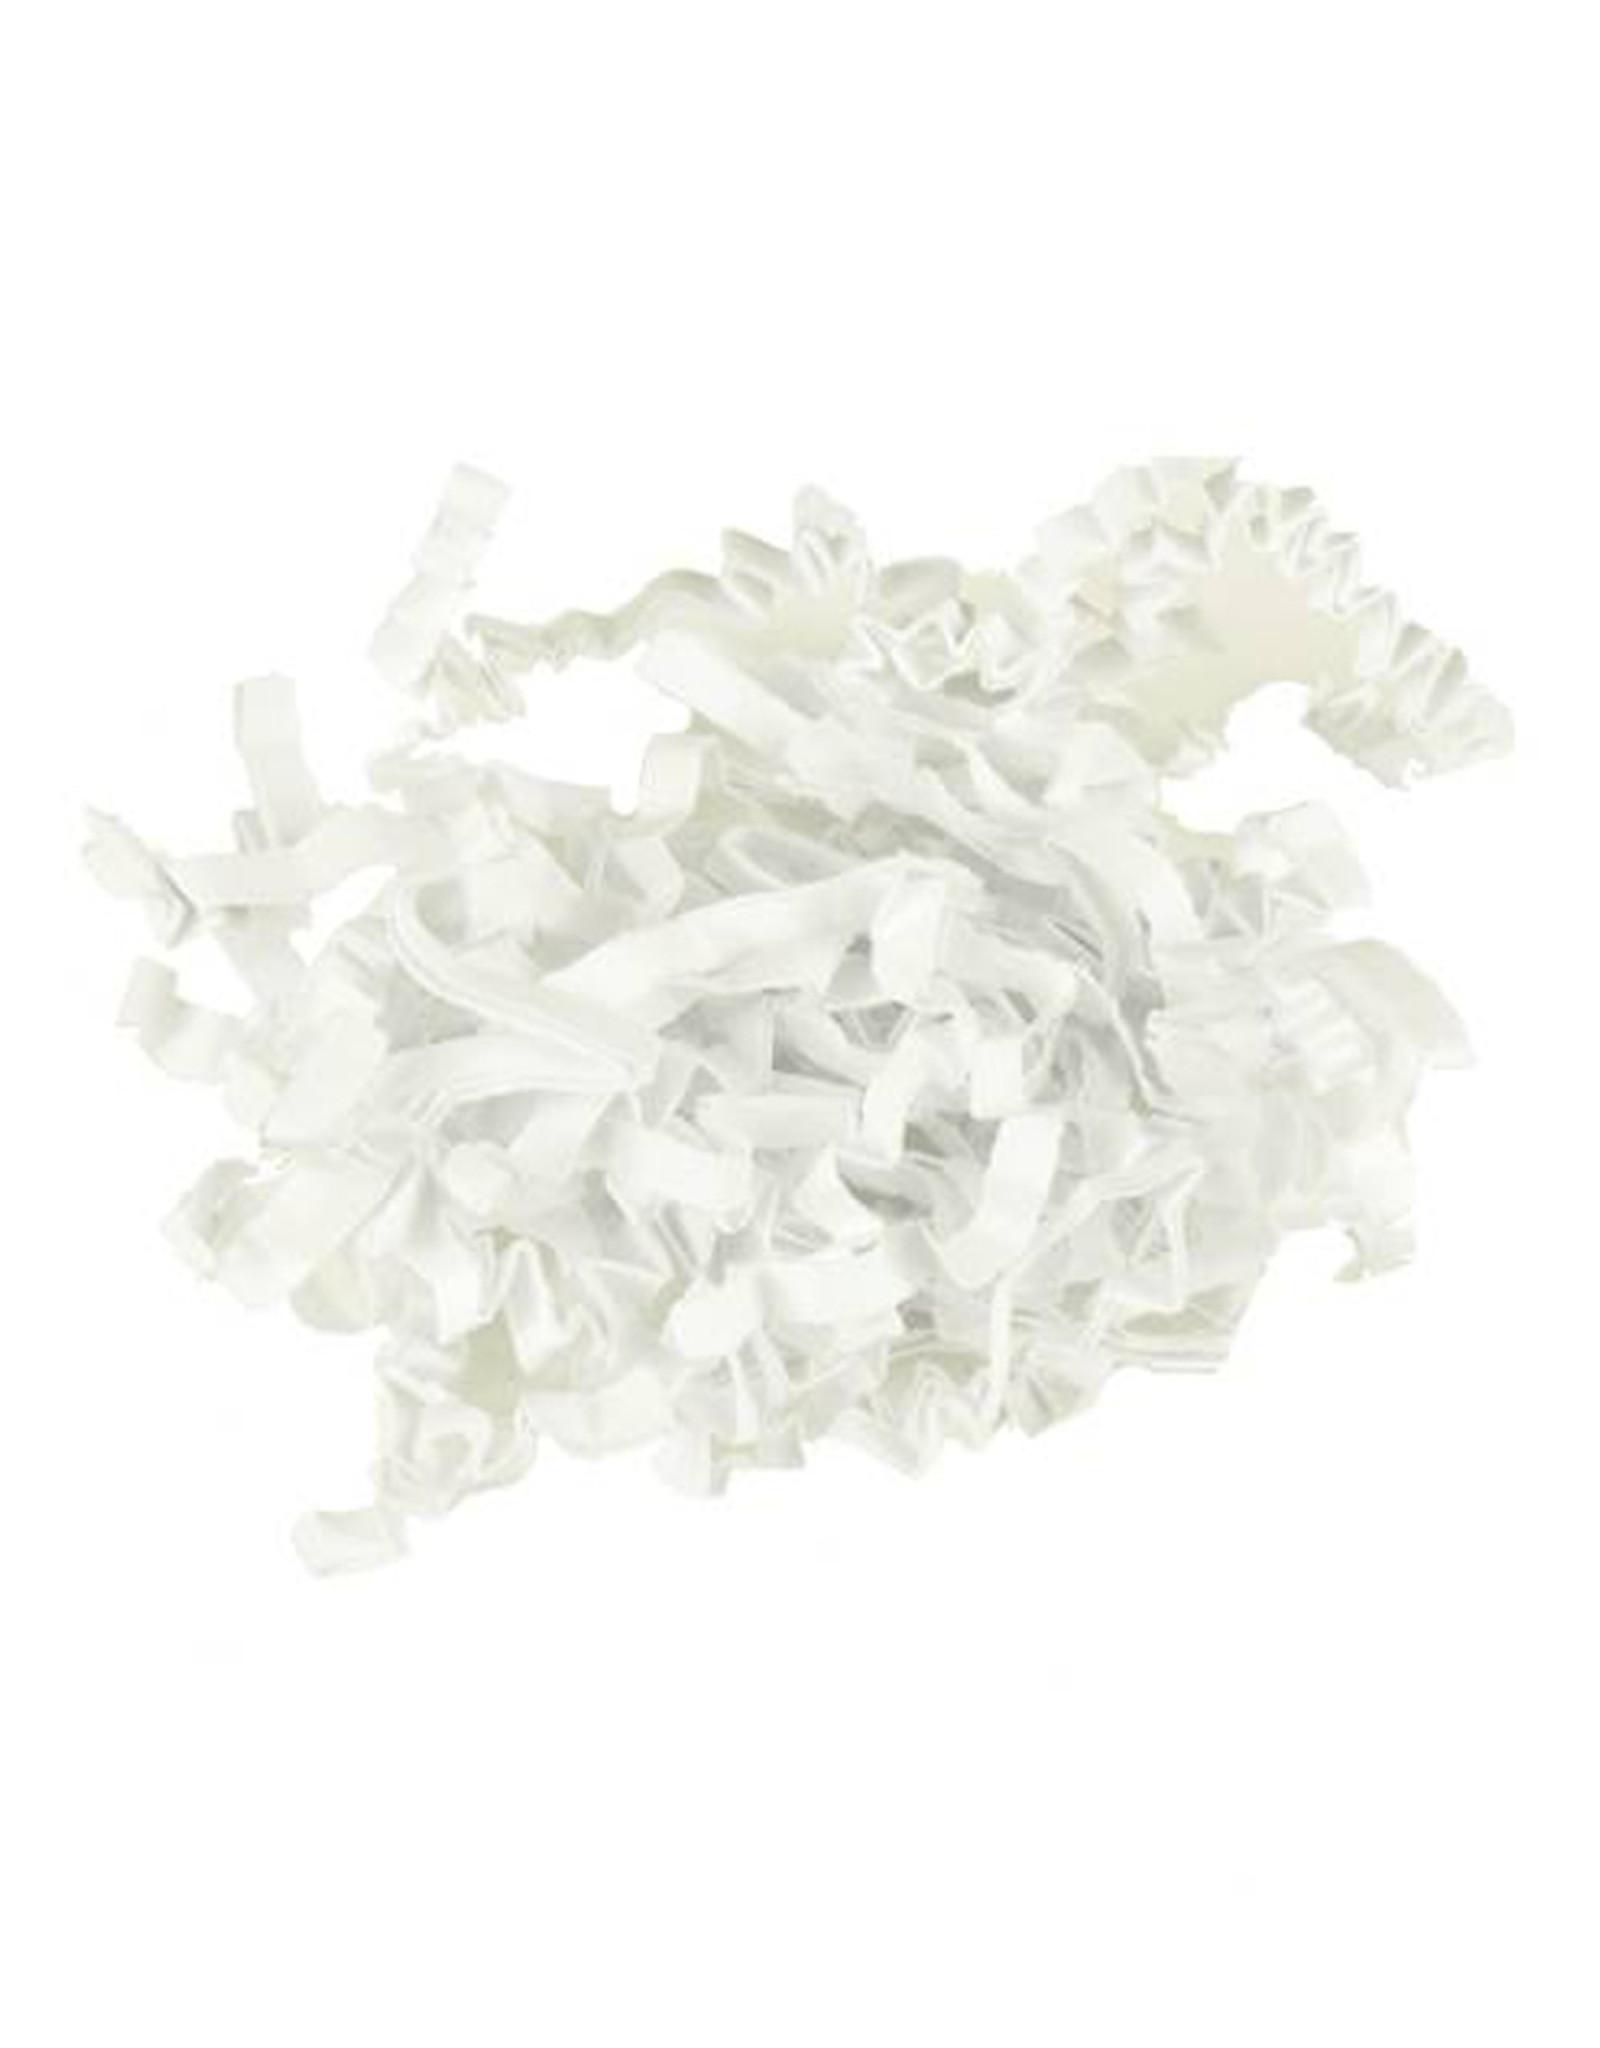 Zigzag box filler - white (1,25 kg)